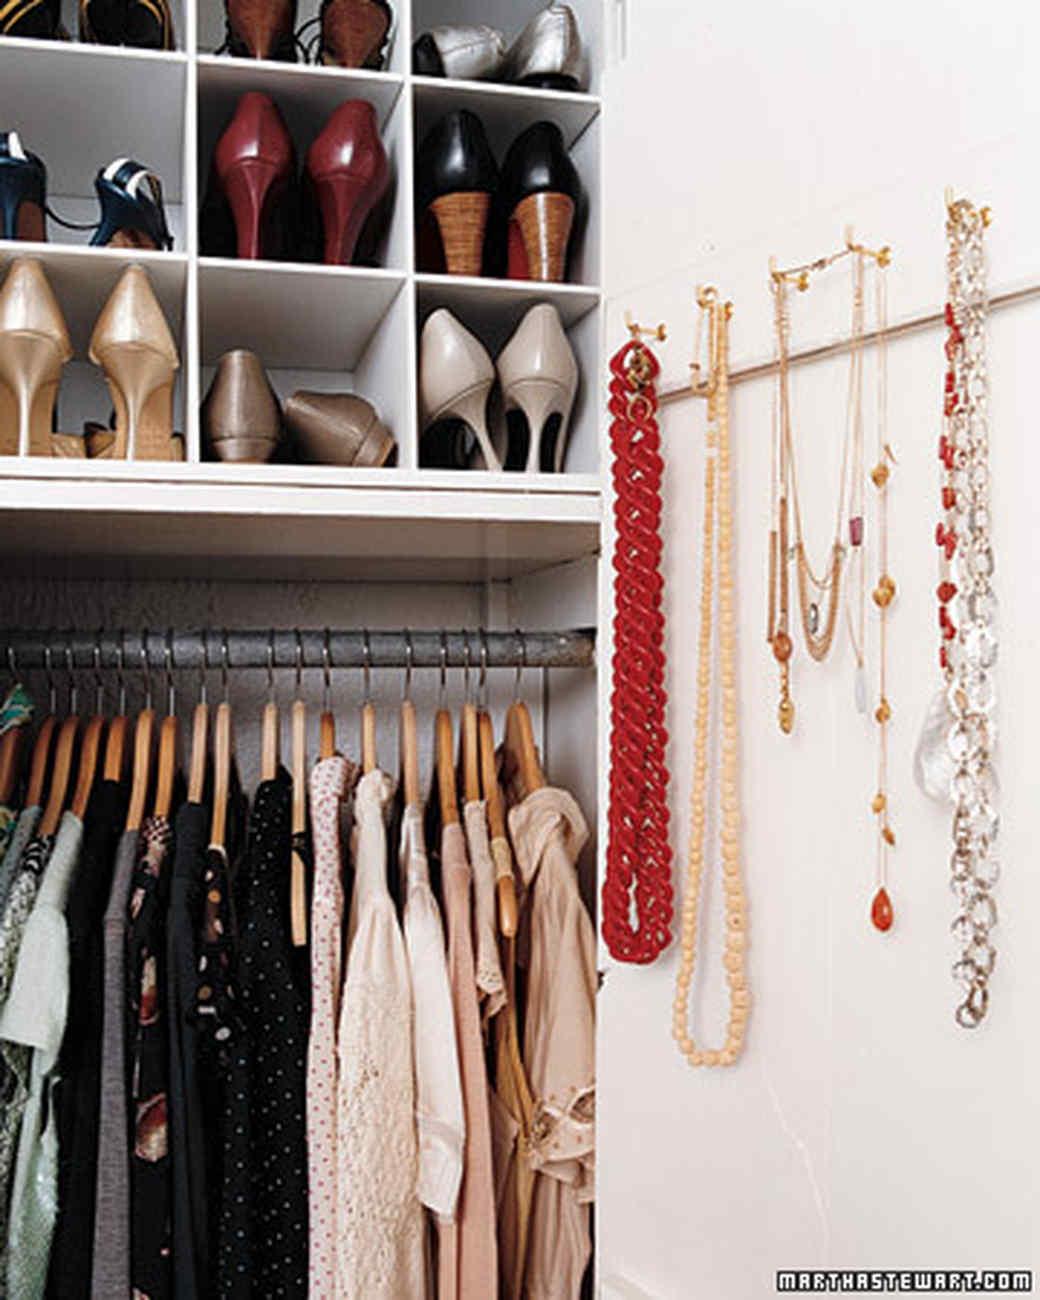 mpa102780_0307_closet.jpg